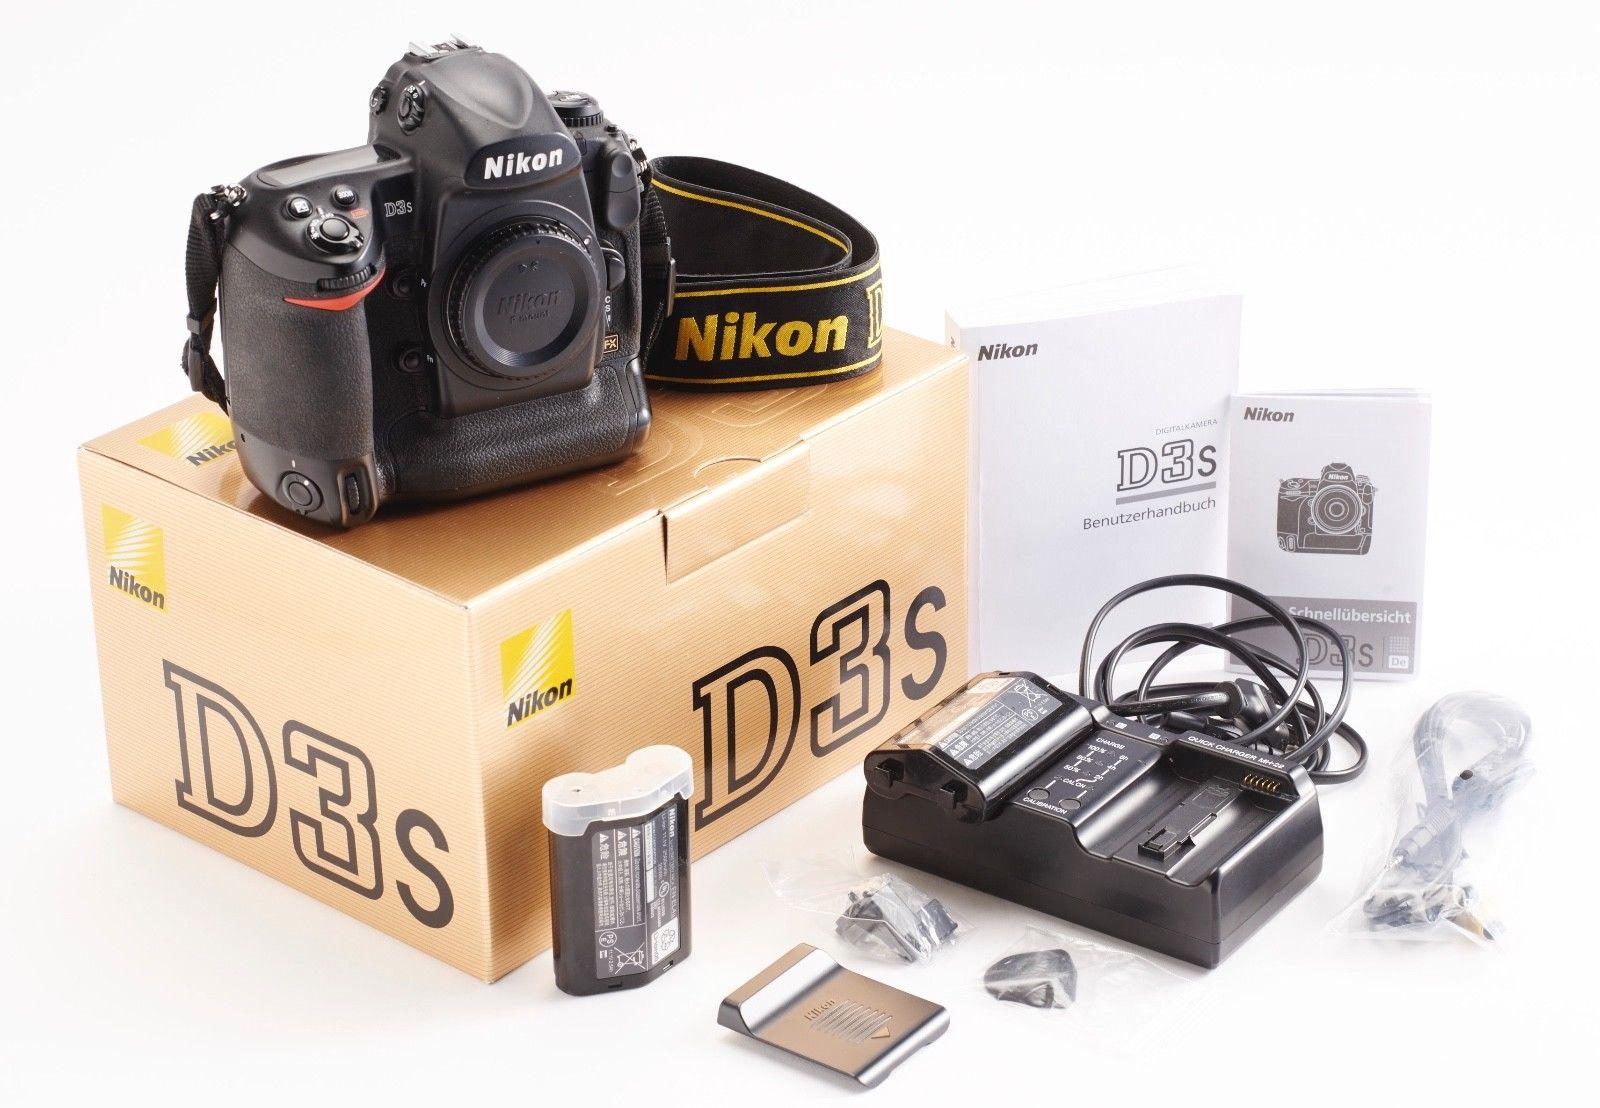 Nikon D D3s 12.1MP Digitalkamera - Body - 108.000 Auslösungen